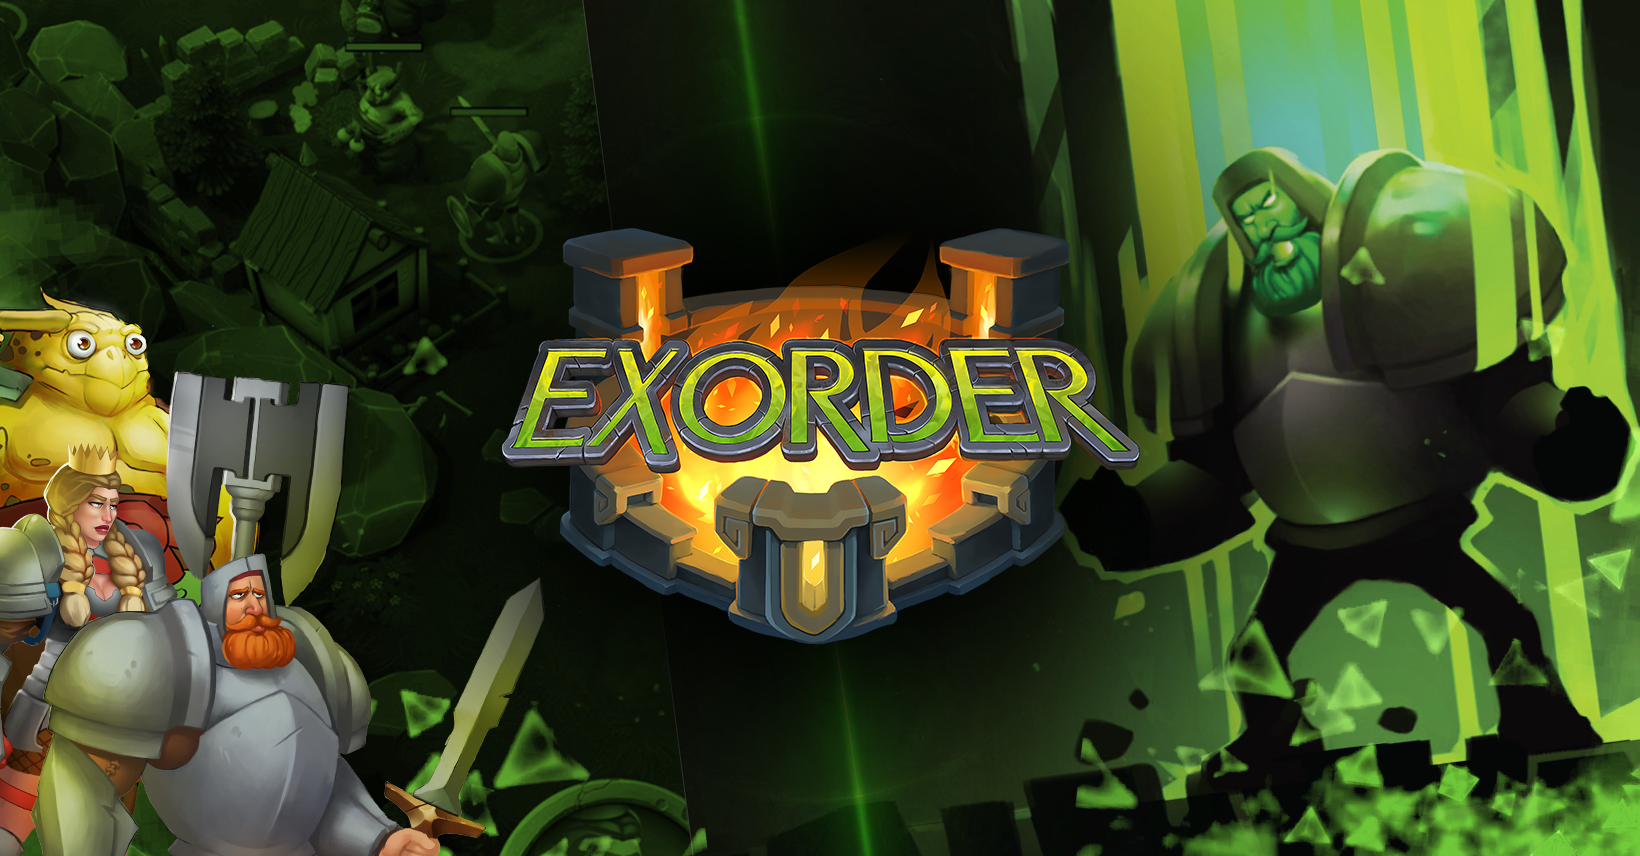 exorder1 2